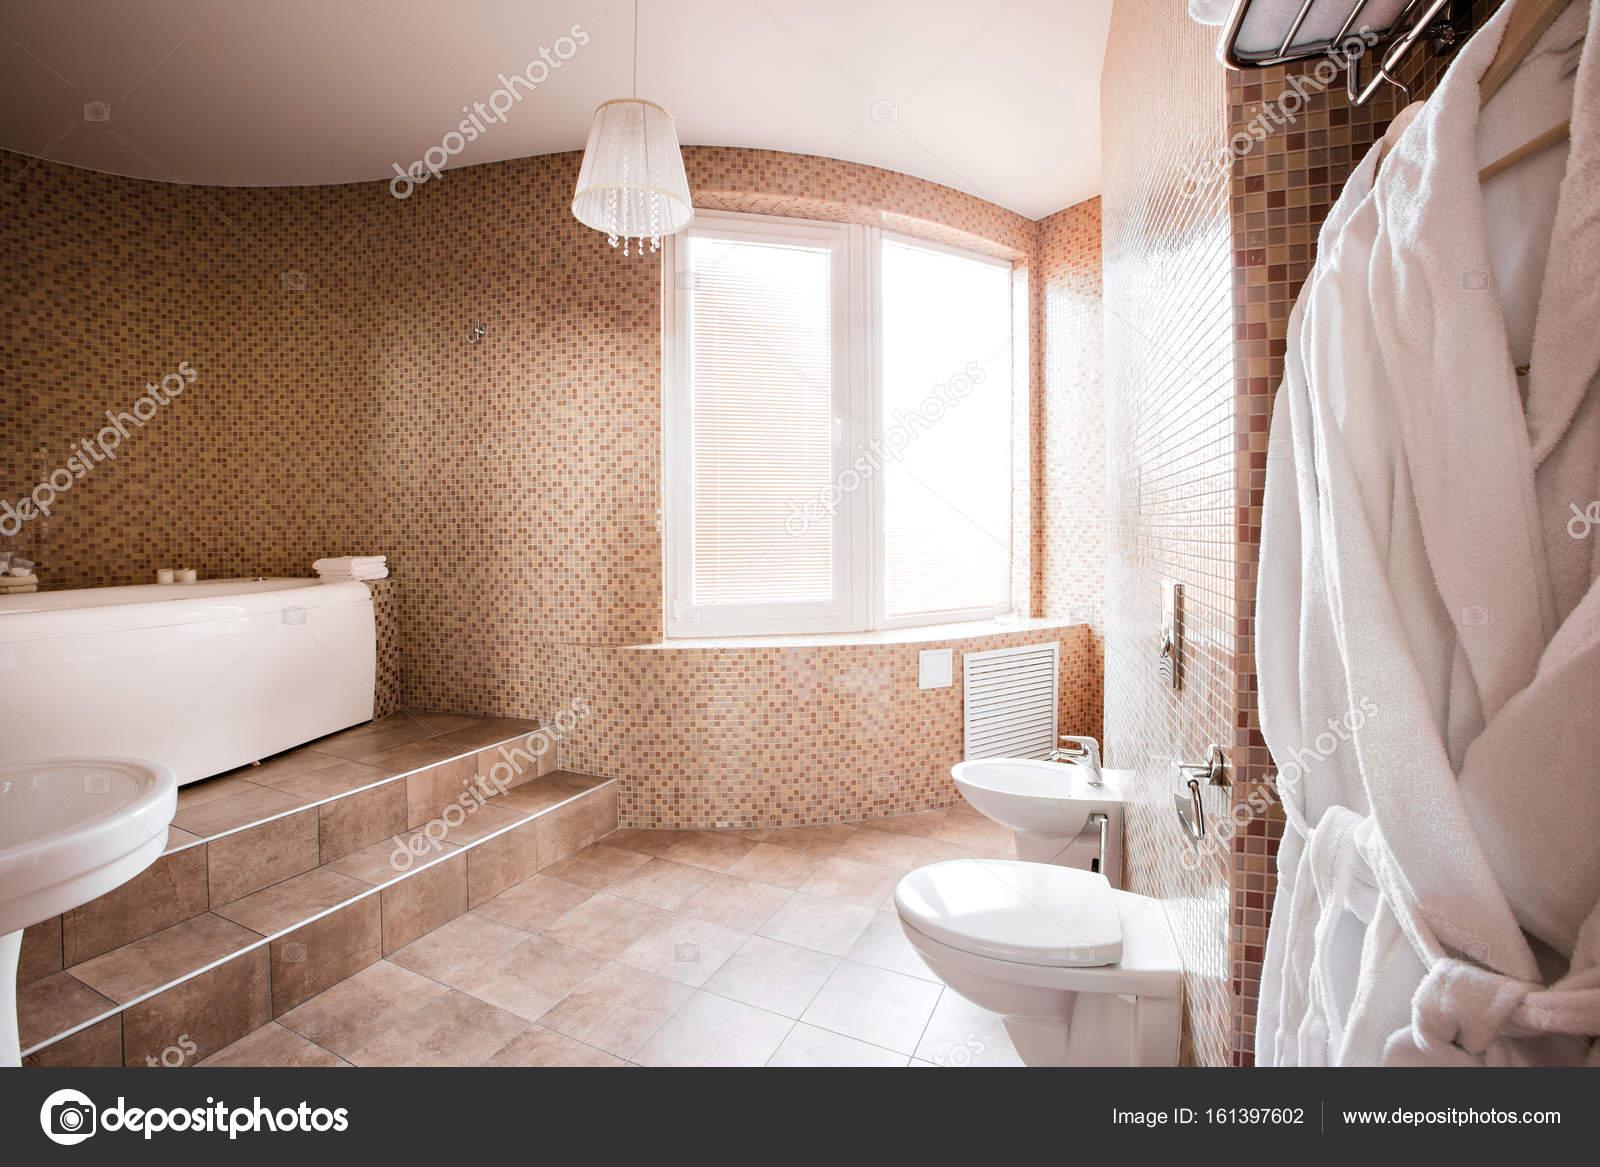 Moderne luxe badkamer met bad en venster. Interieur design ...